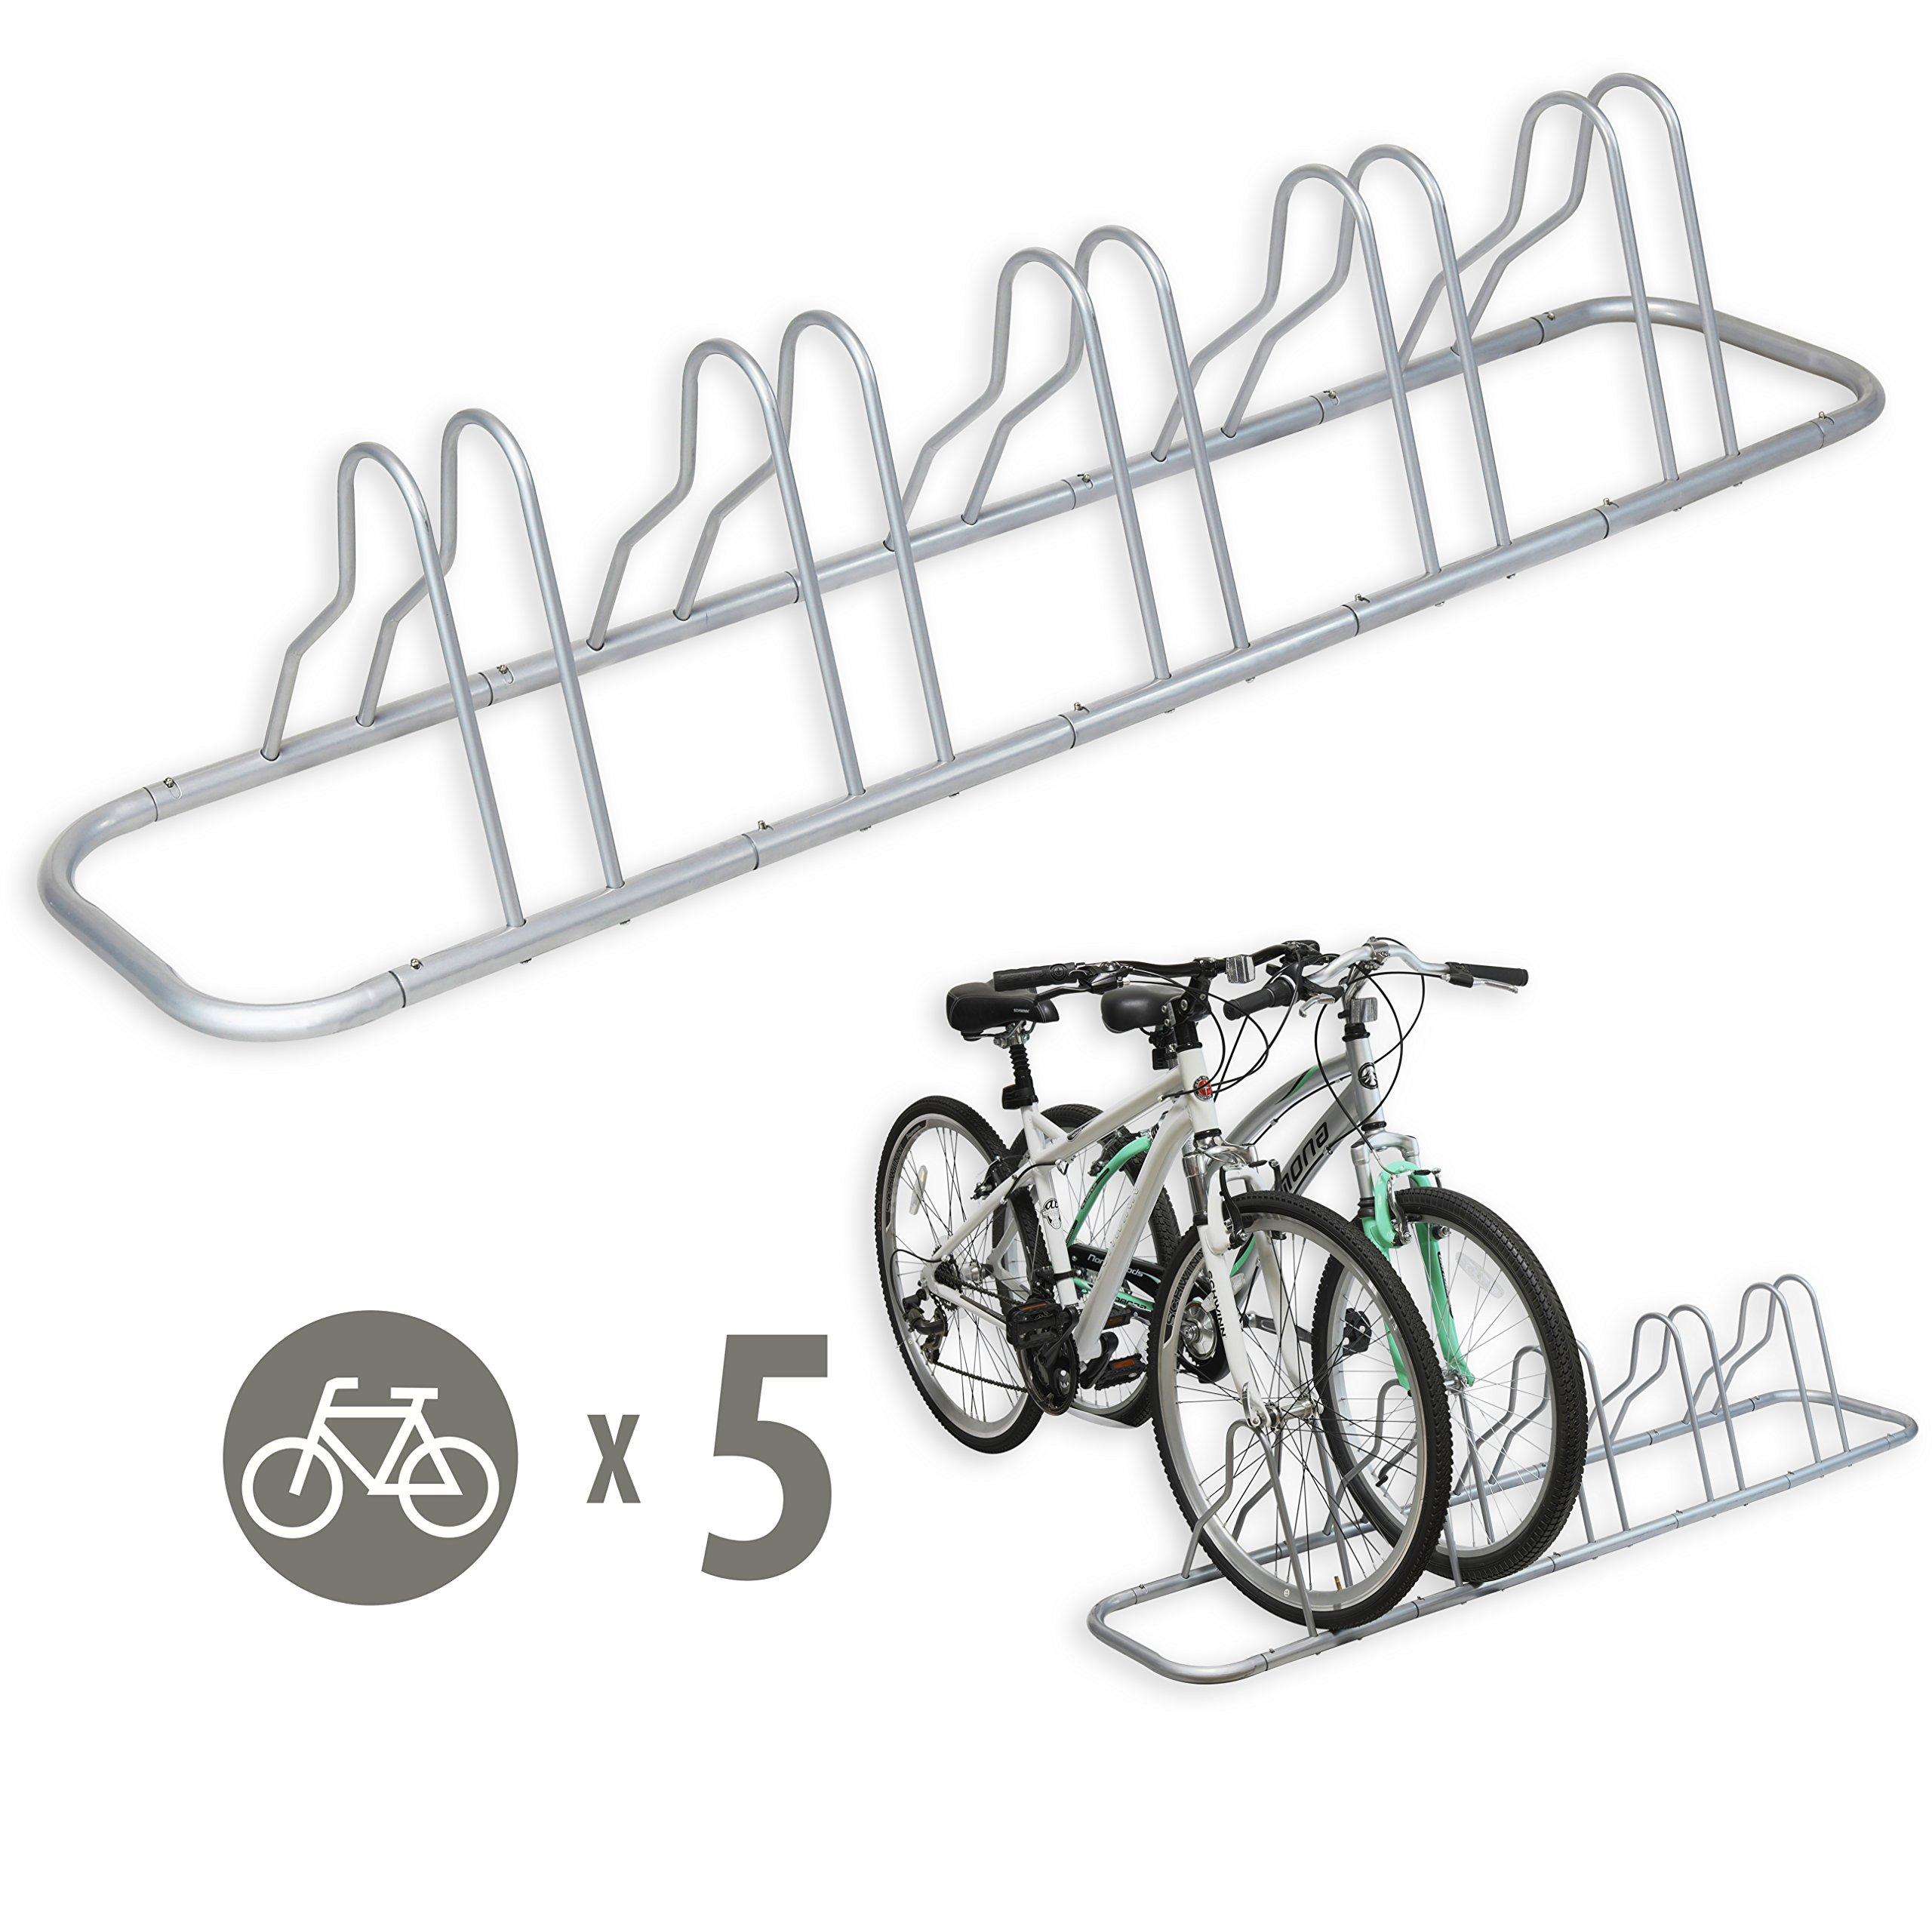 Simple Houseware 5 Bike Bicycle Floor Parking Adjustable Storage Stand, Silver by Simple Houseware (Image #1)